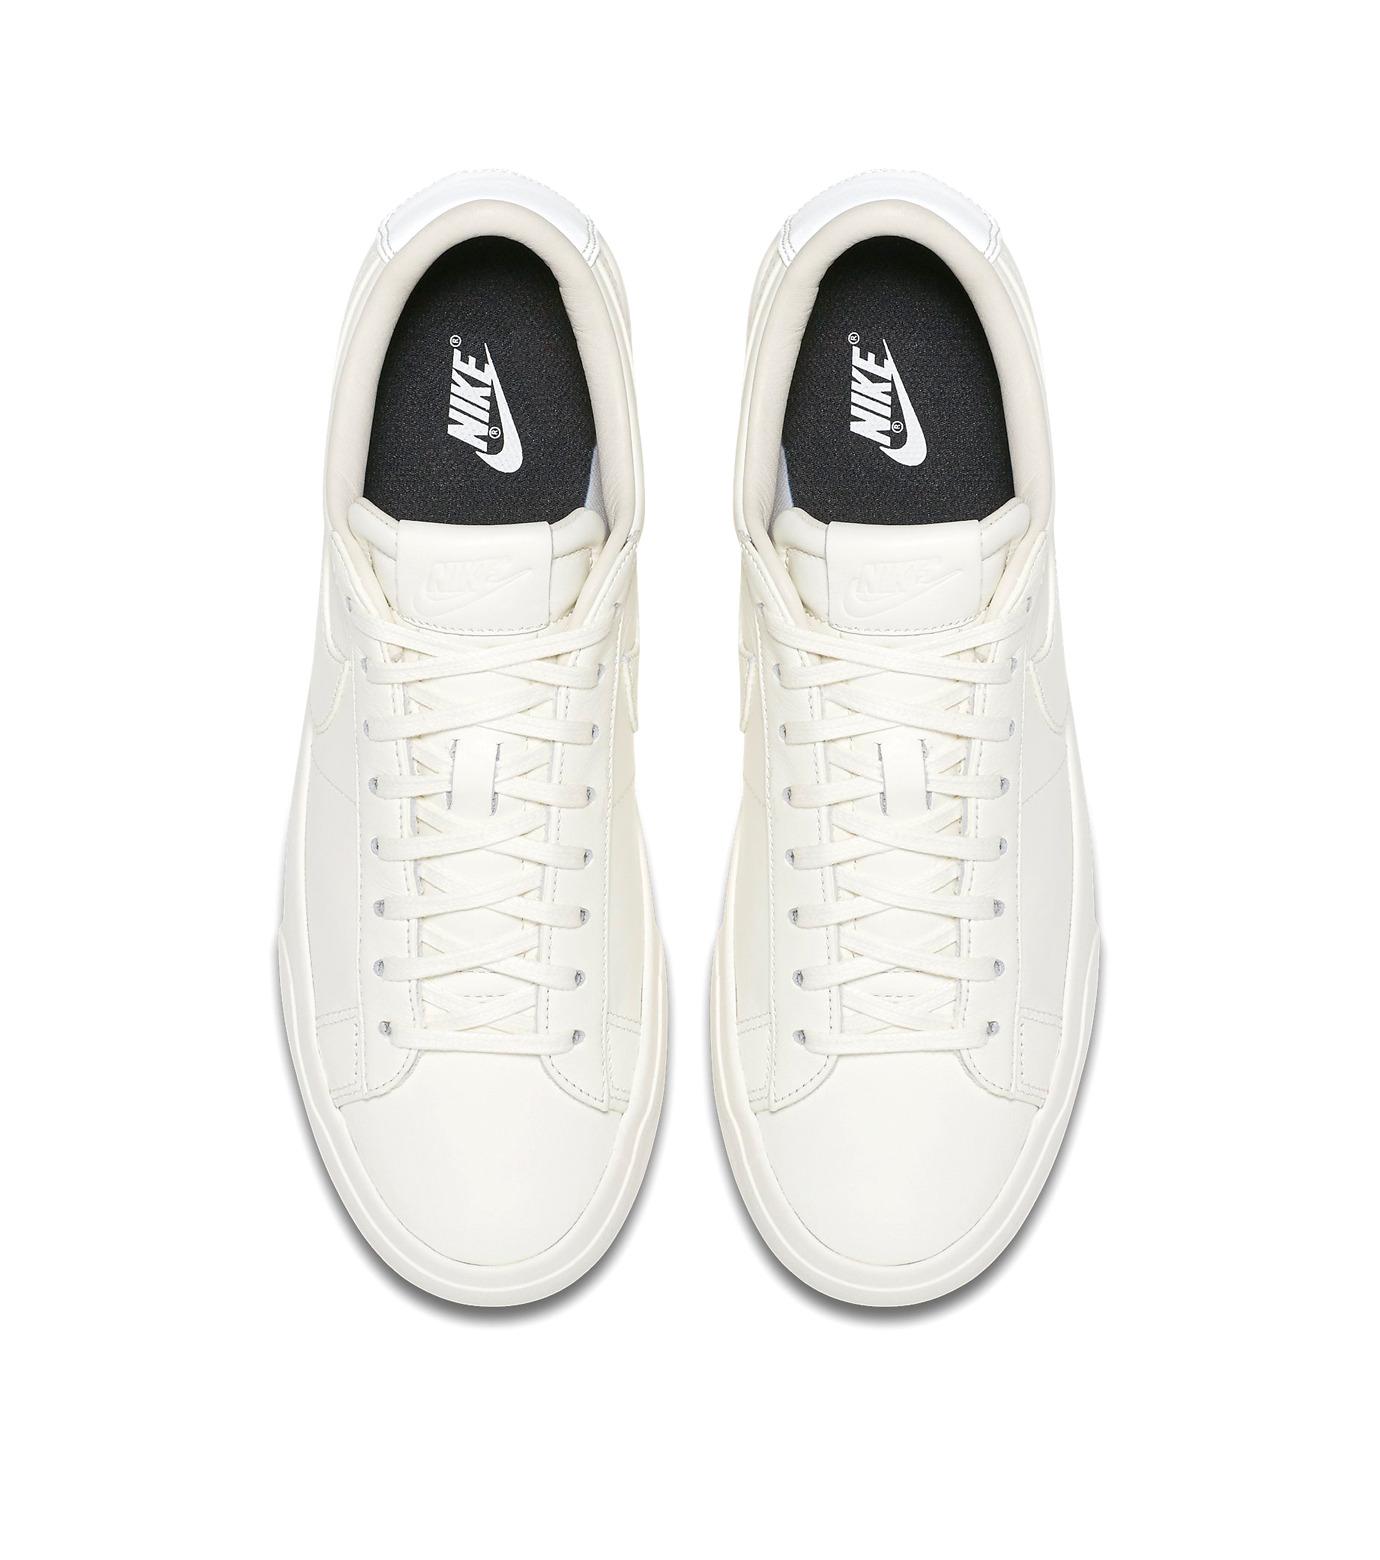 NIKE(ナイキ)のBLAZER STUDIO LOW-WHITE(シューズ/shoes)-904804-100-4 拡大詳細画像5